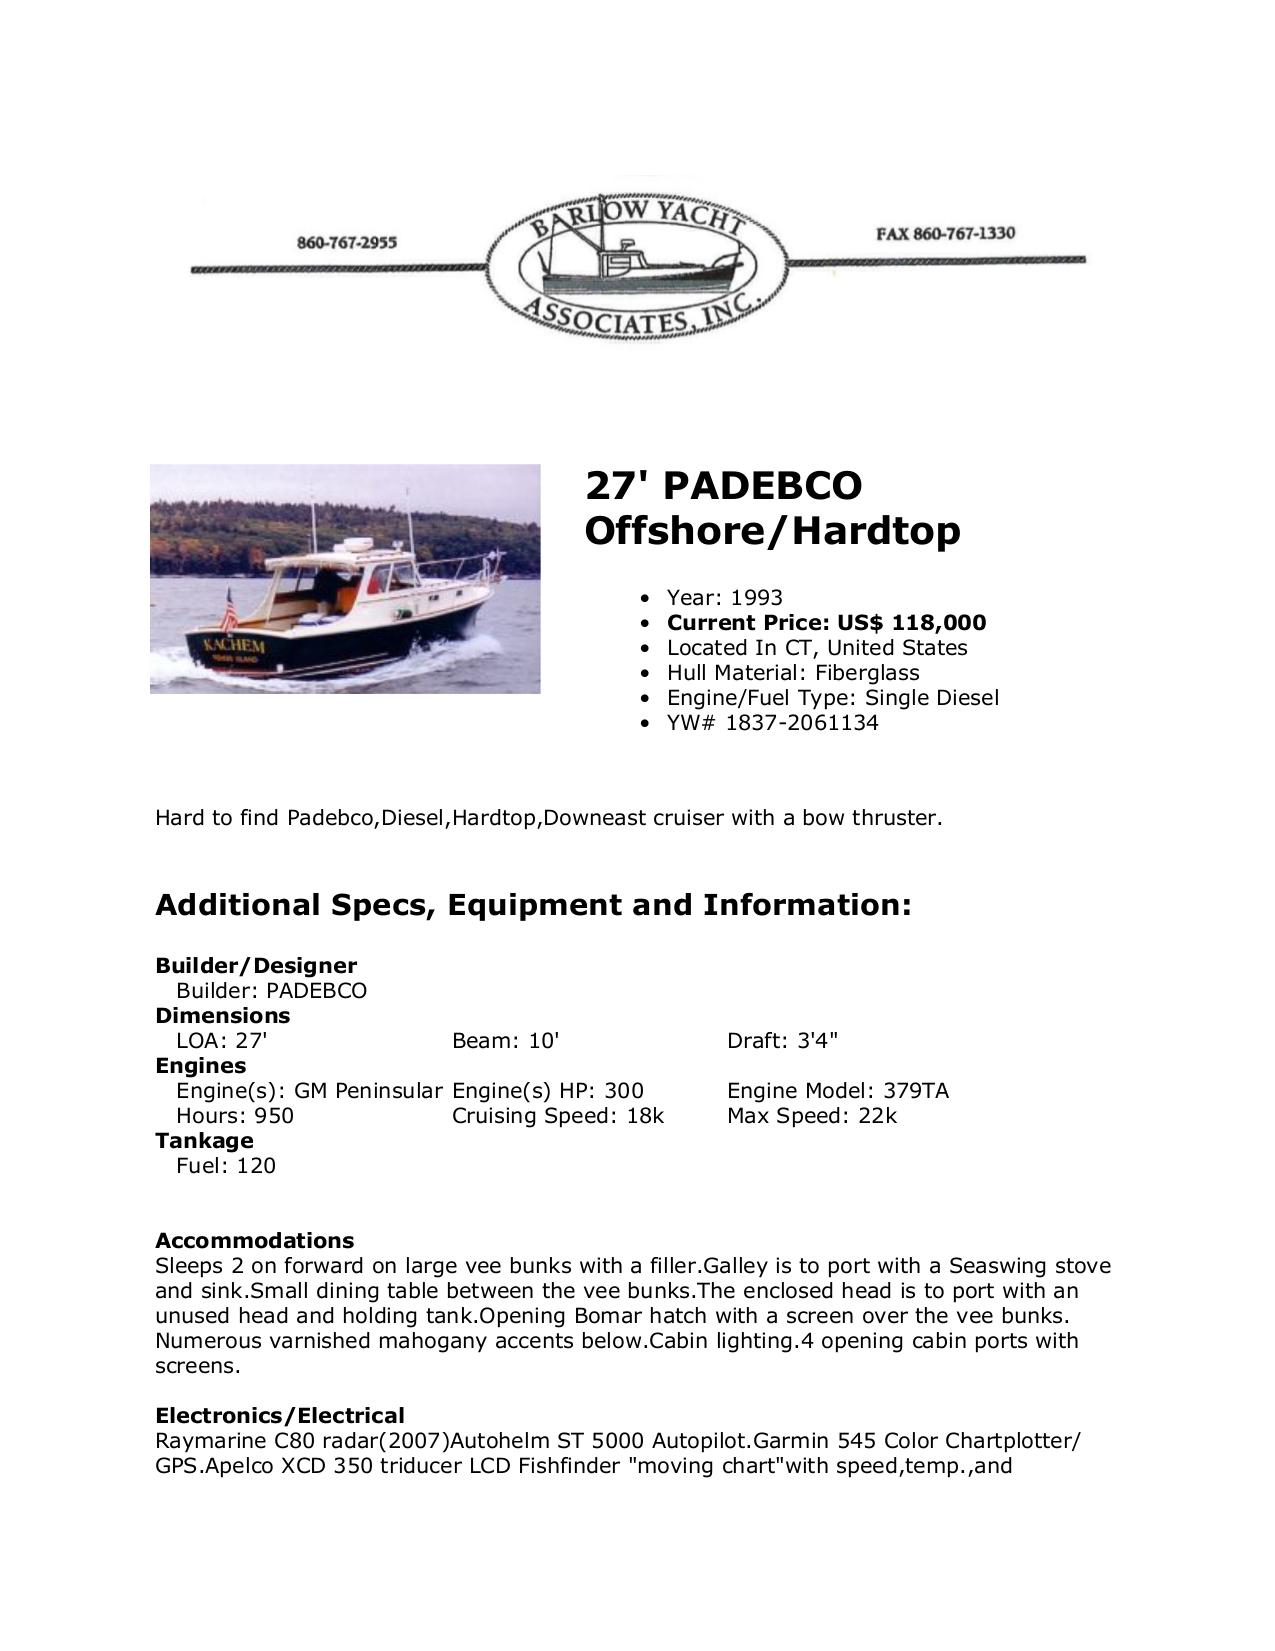 download free pdf for raymarine autohelm st5000 gps manual rh umlib com Raymarine Autohelm 4000 raymarine autopilot st5000+ manual